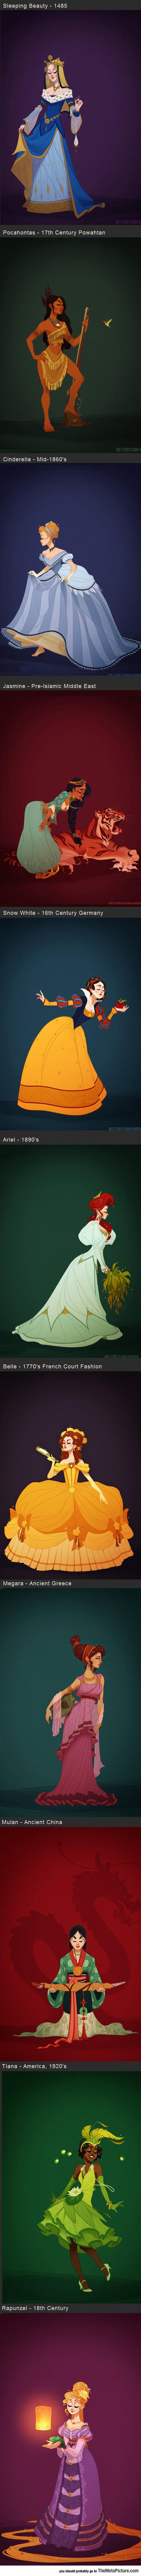 cool-Disney-Princesses-costume-drawing